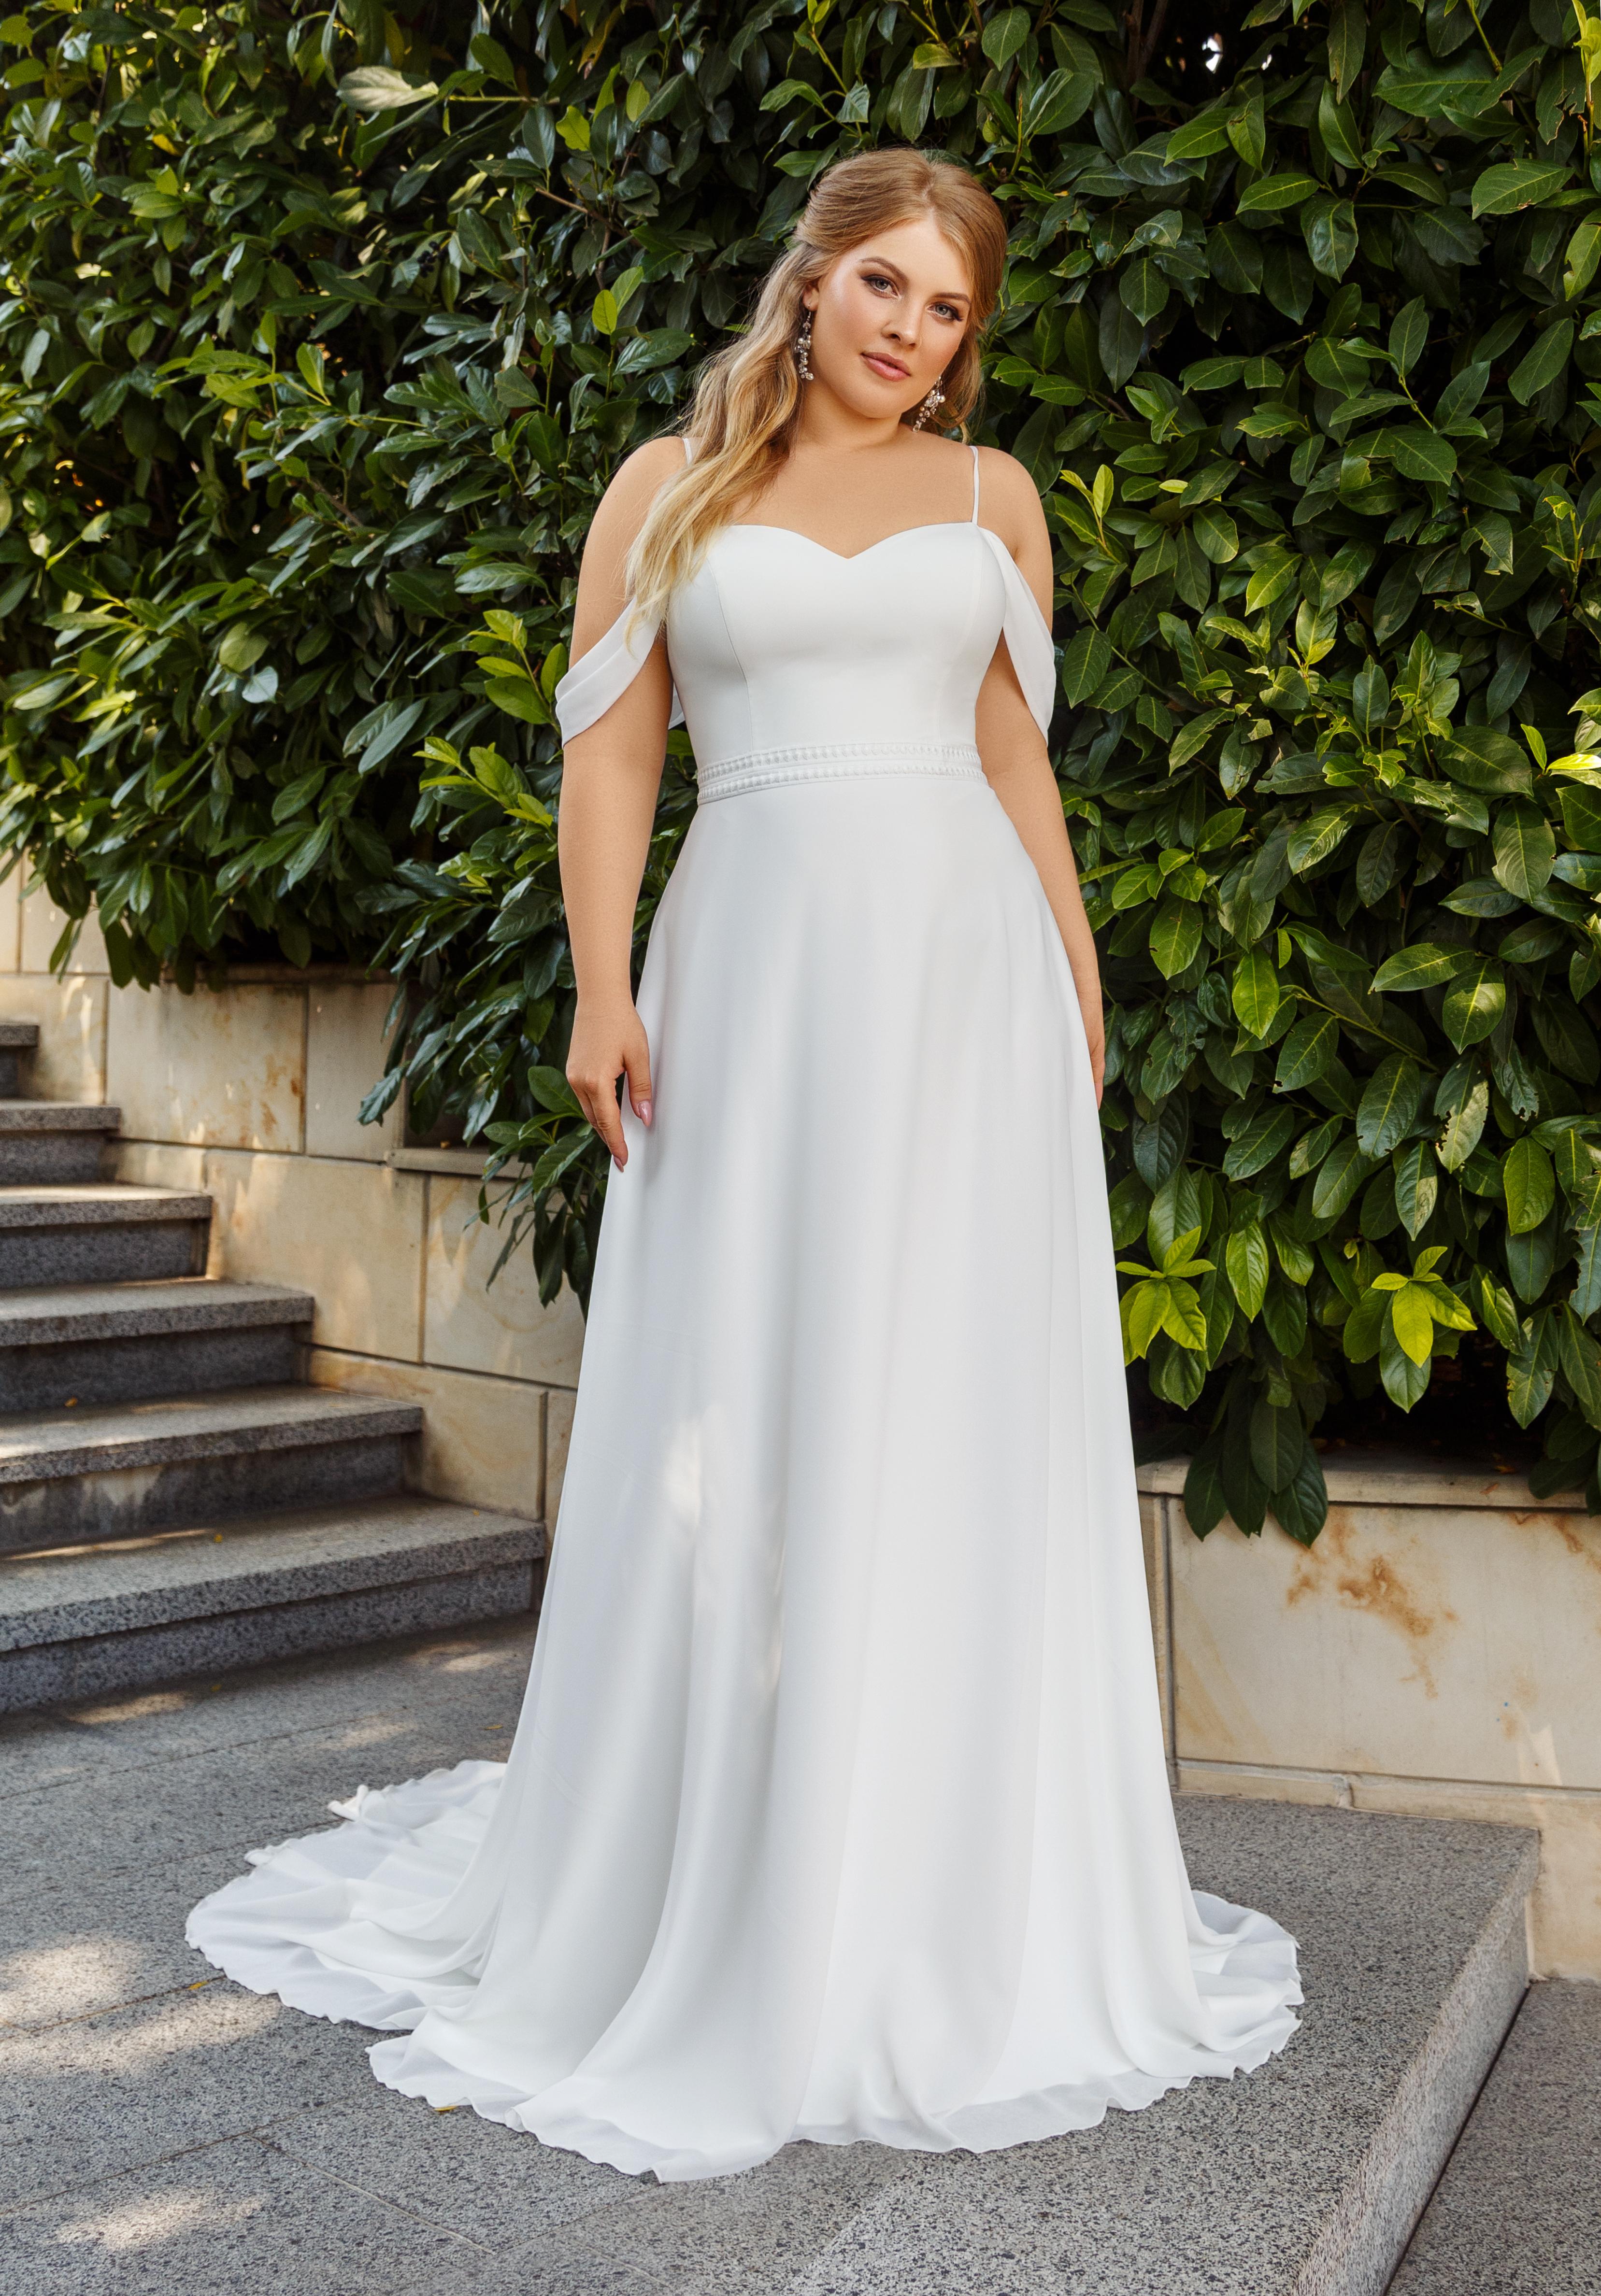 Wedding dresses by Angela Bianca